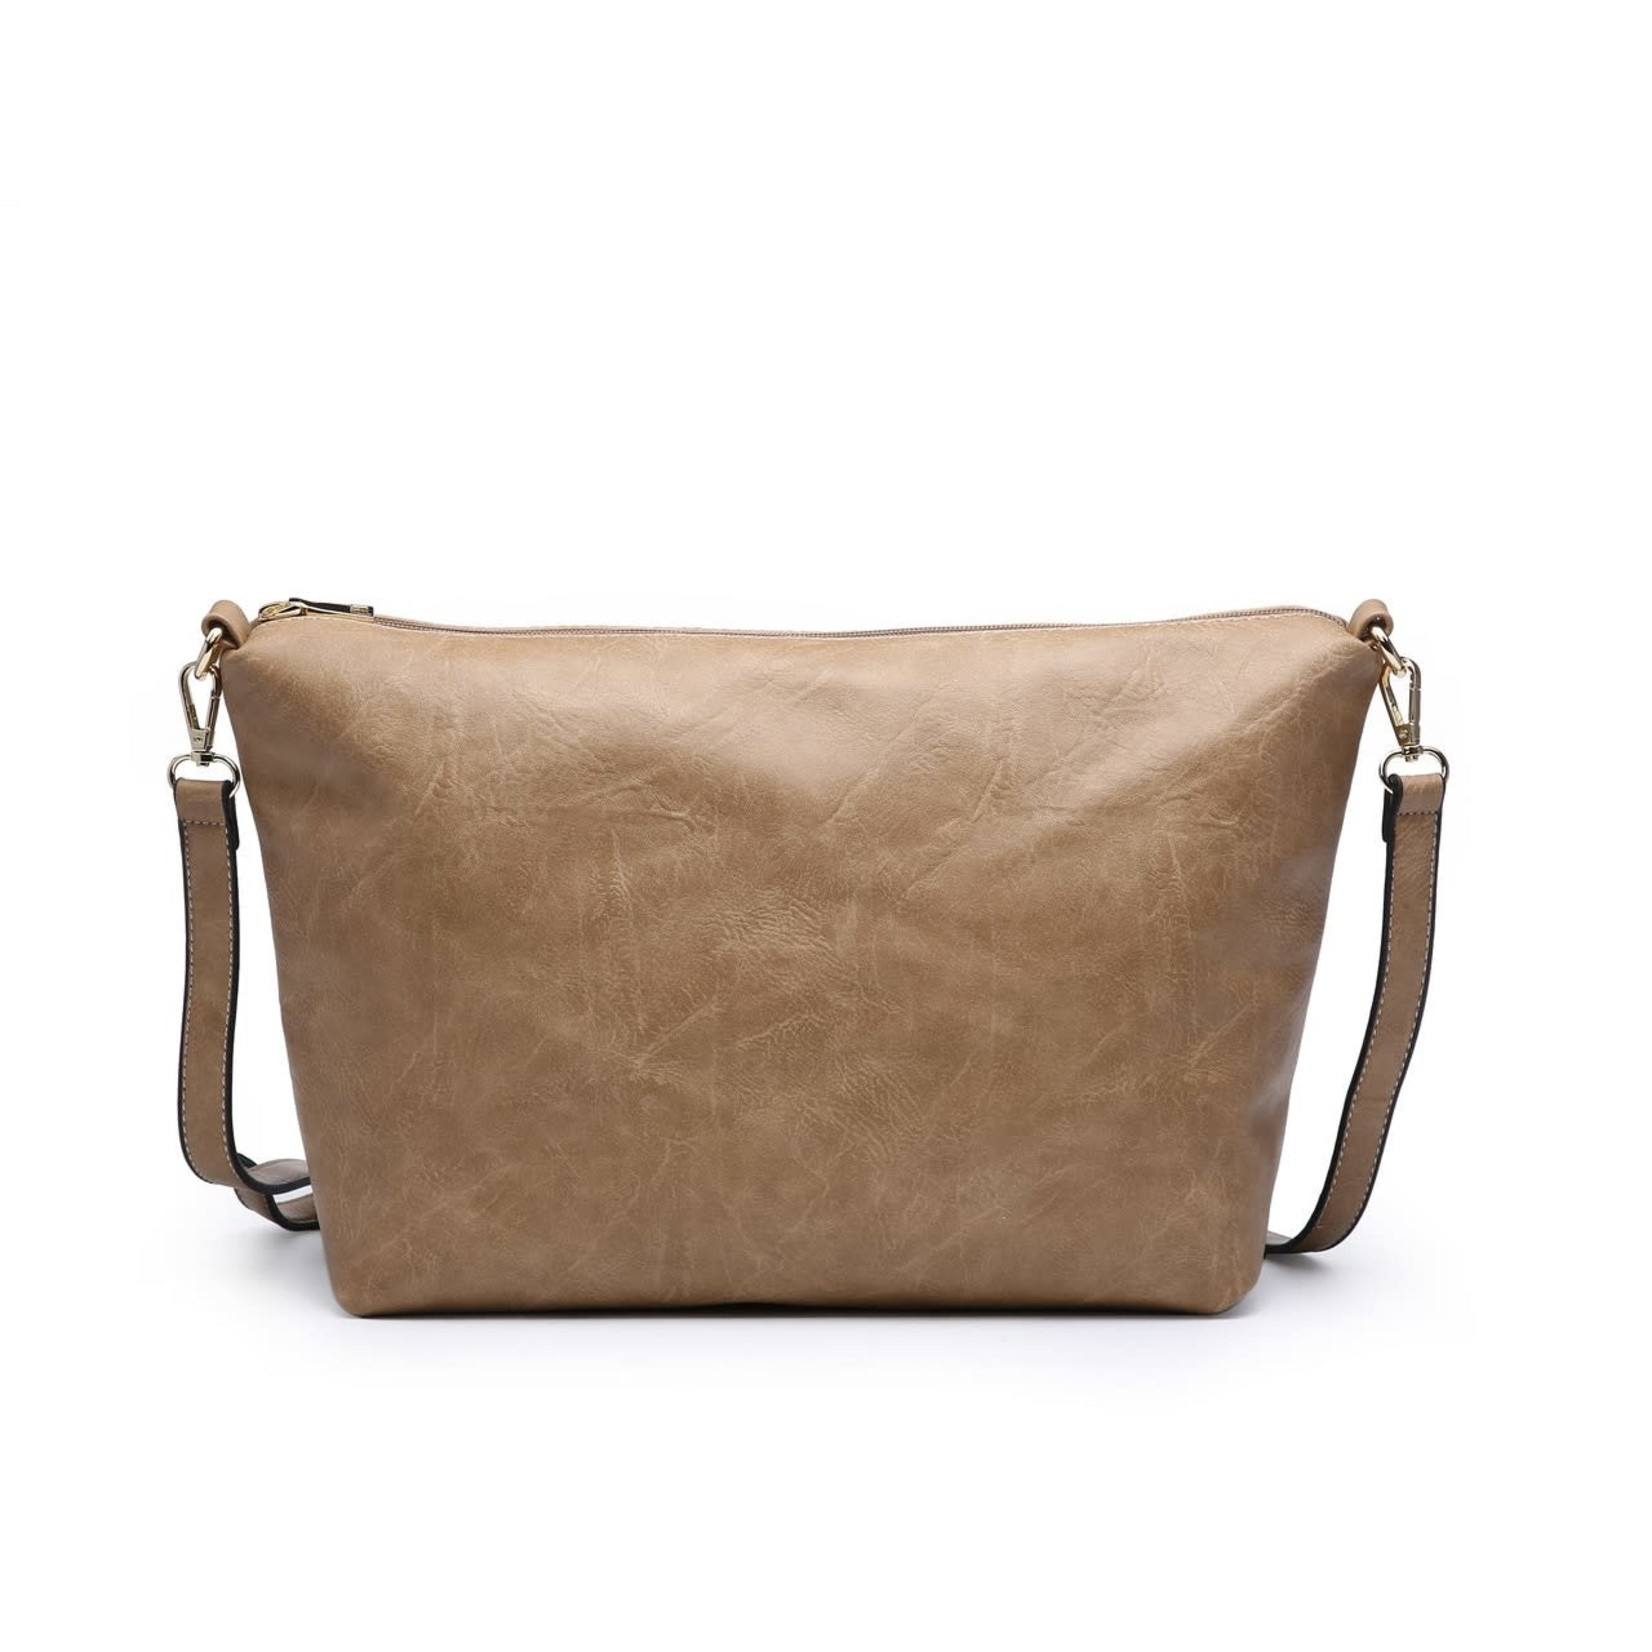 Iris Soft Vegan Tote w/ Bag Inside Mustard (MD)